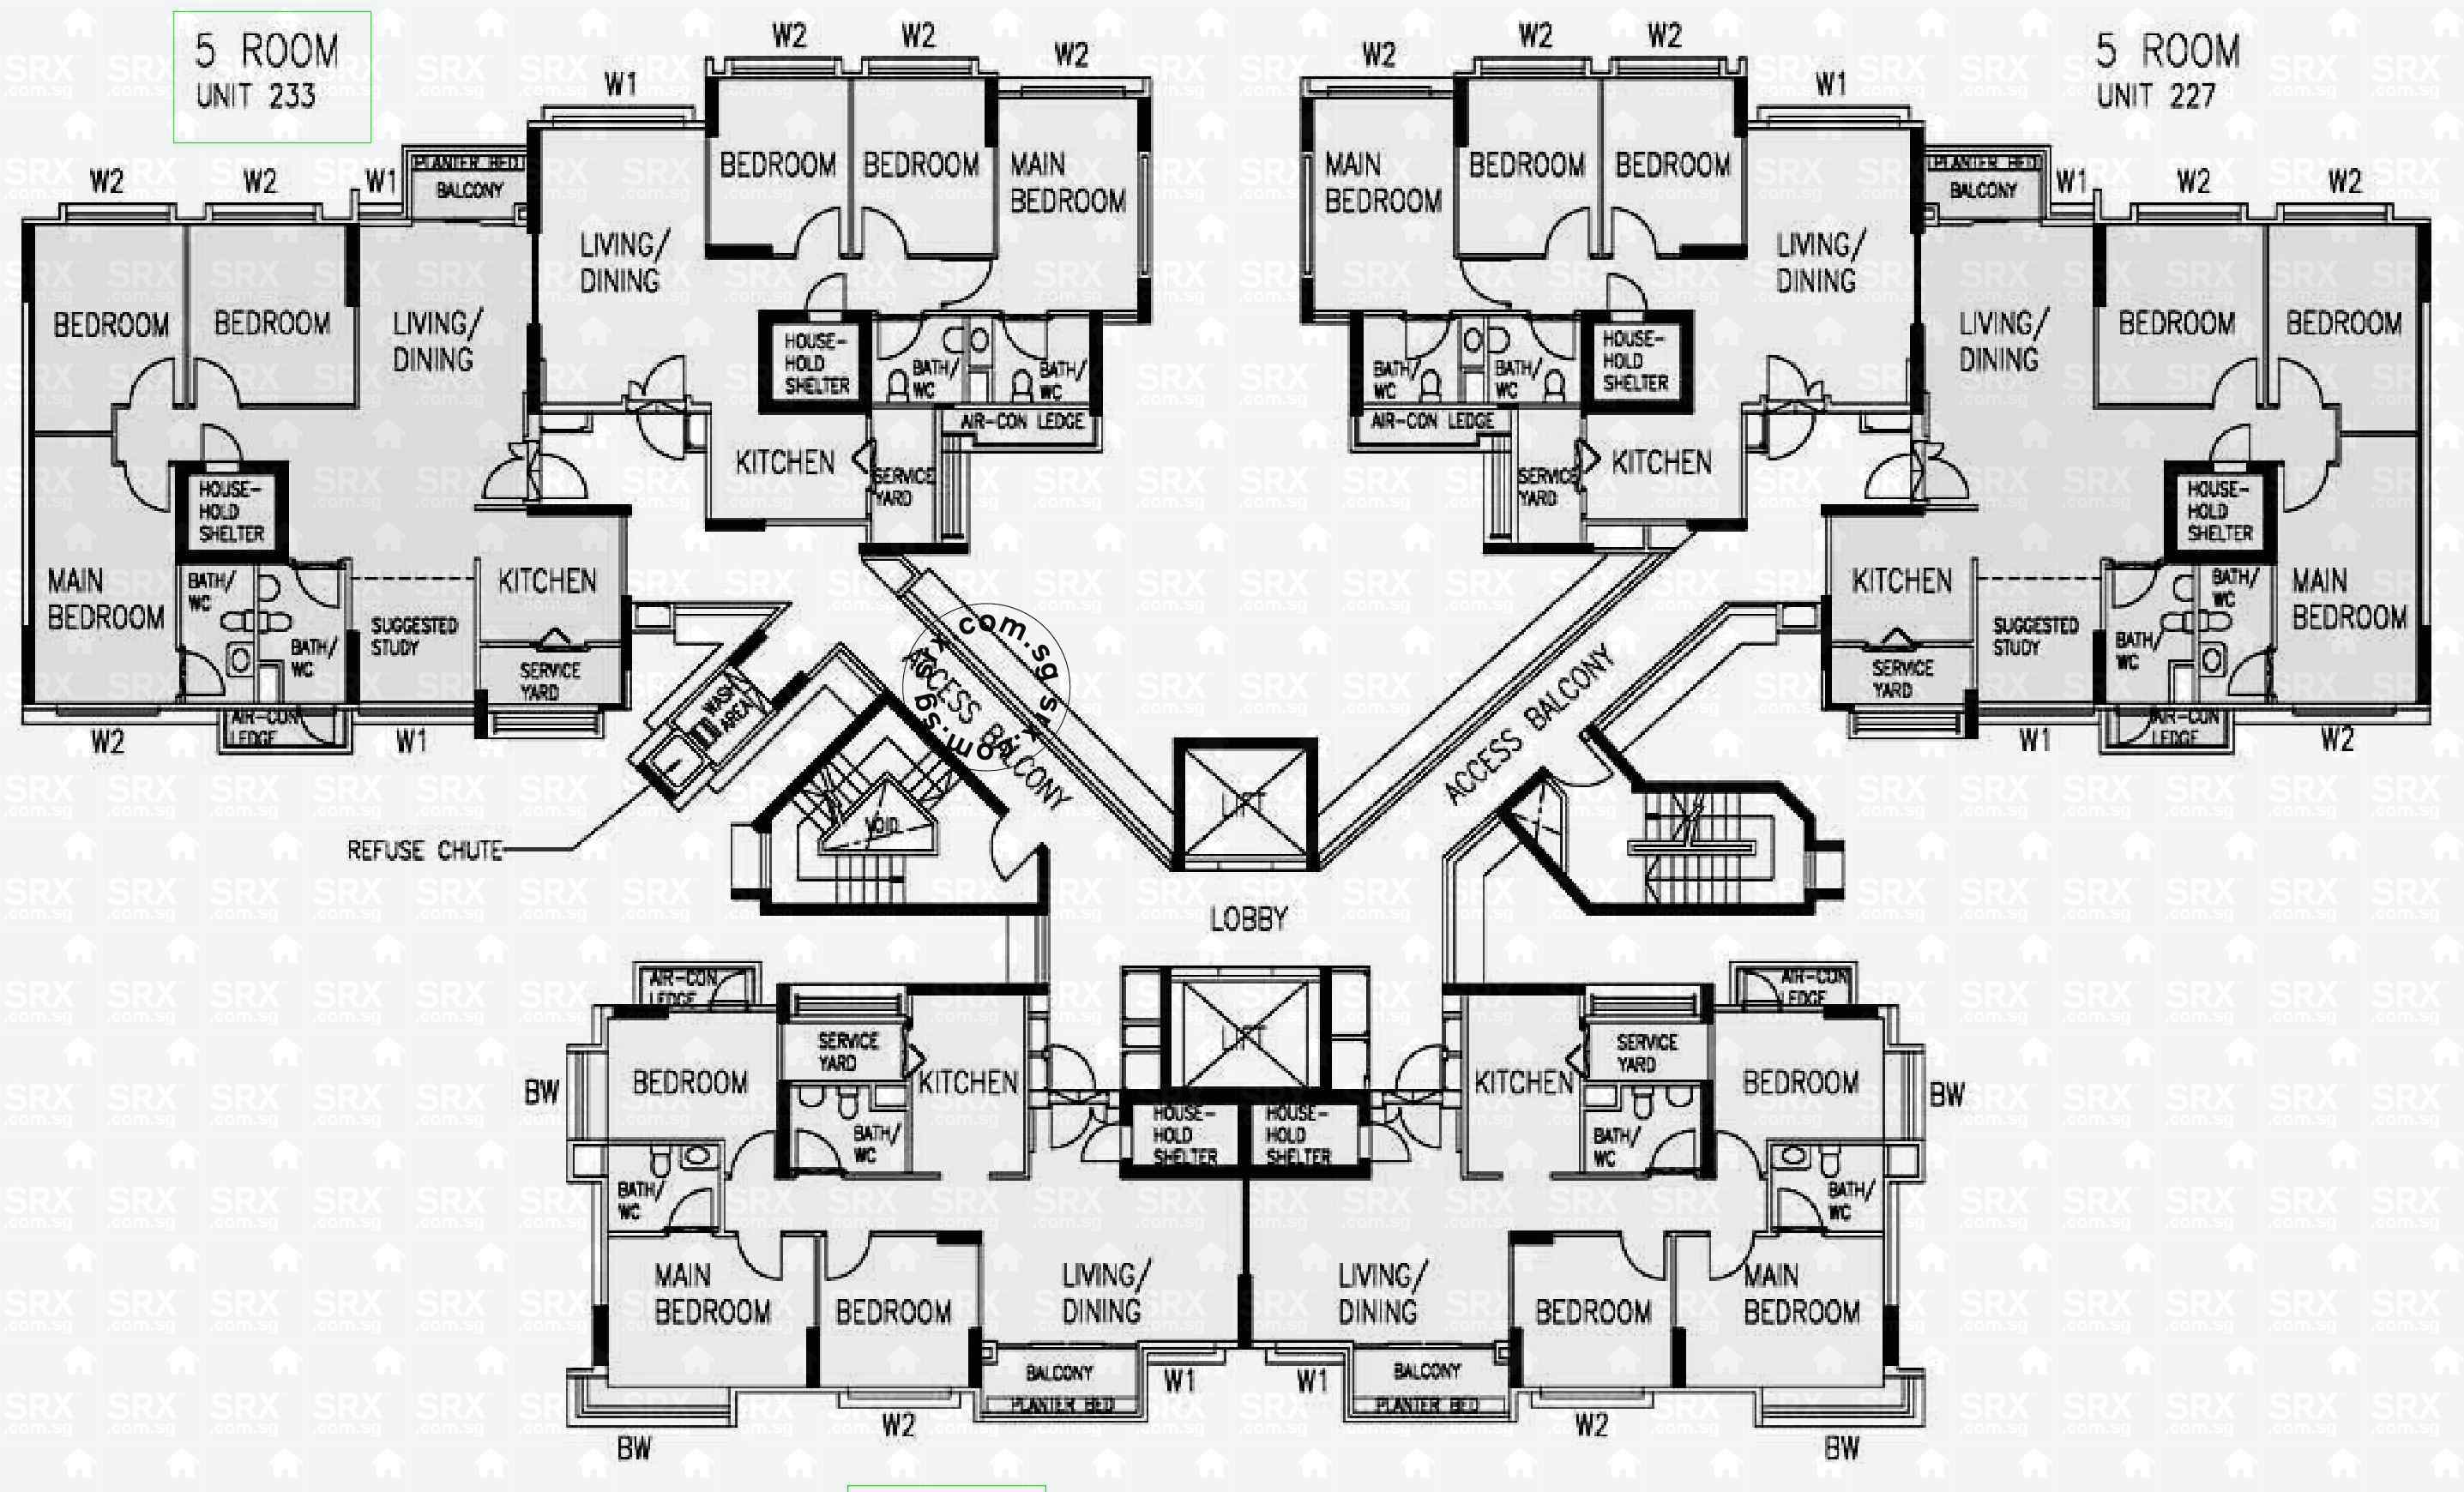 Punggol Field Floor Plan Image #1